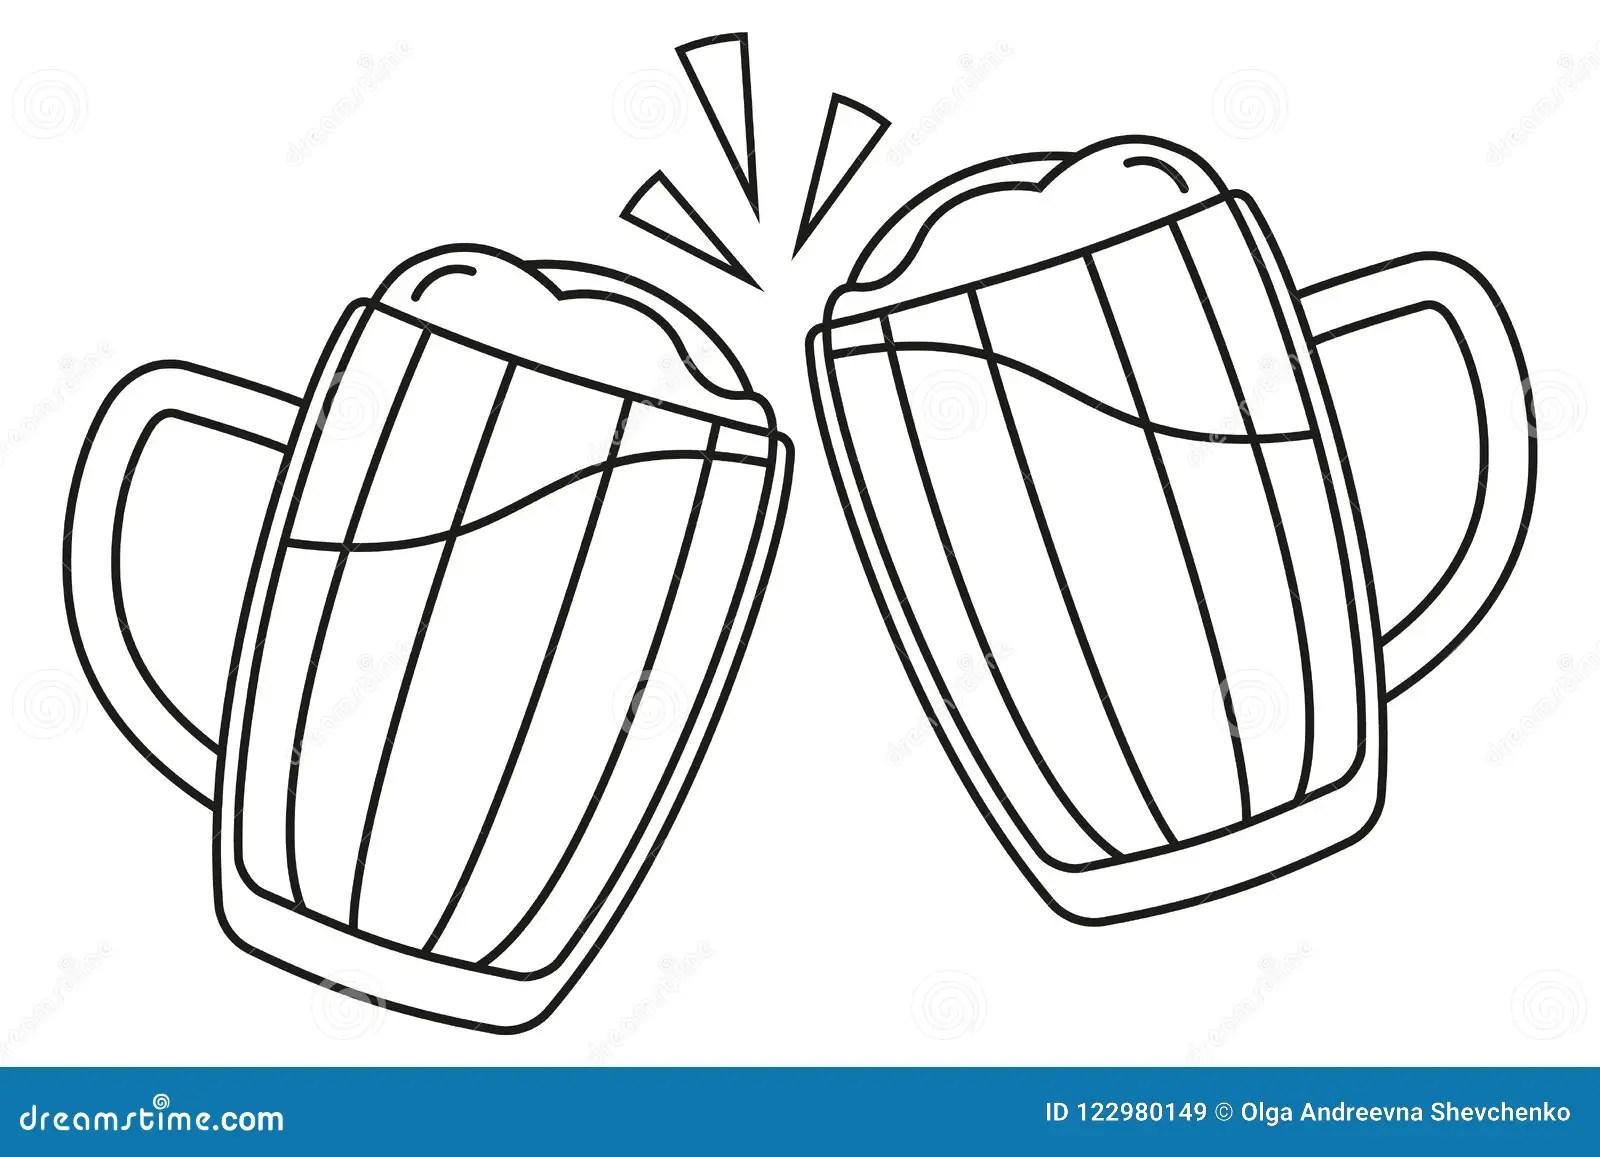 Line Art Black And White Two Beer Mug Stock Vector